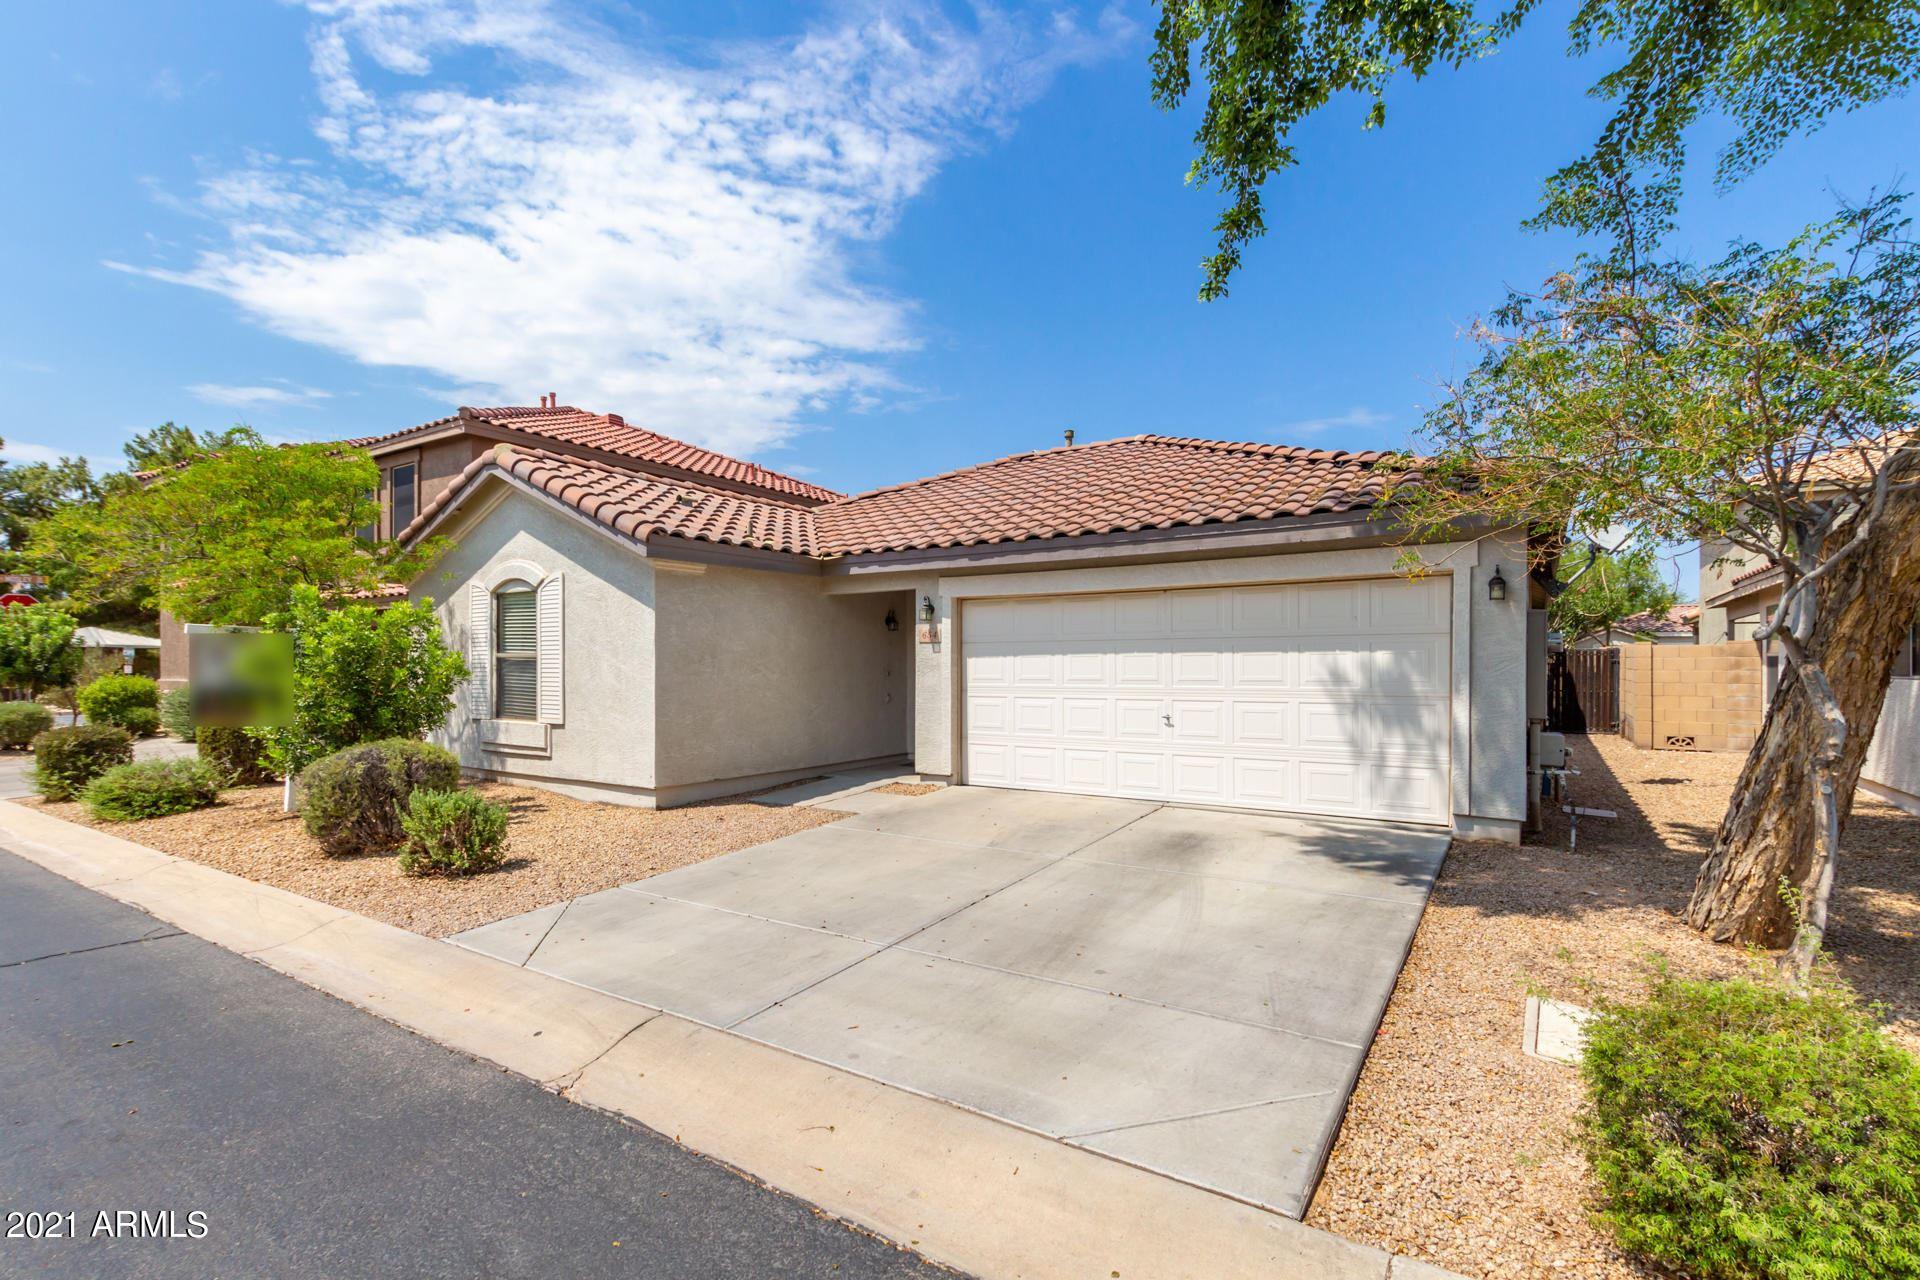 Photo of 654 E WINCHESTER Way, Chandler, AZ 85286 (MLS # 6269001)